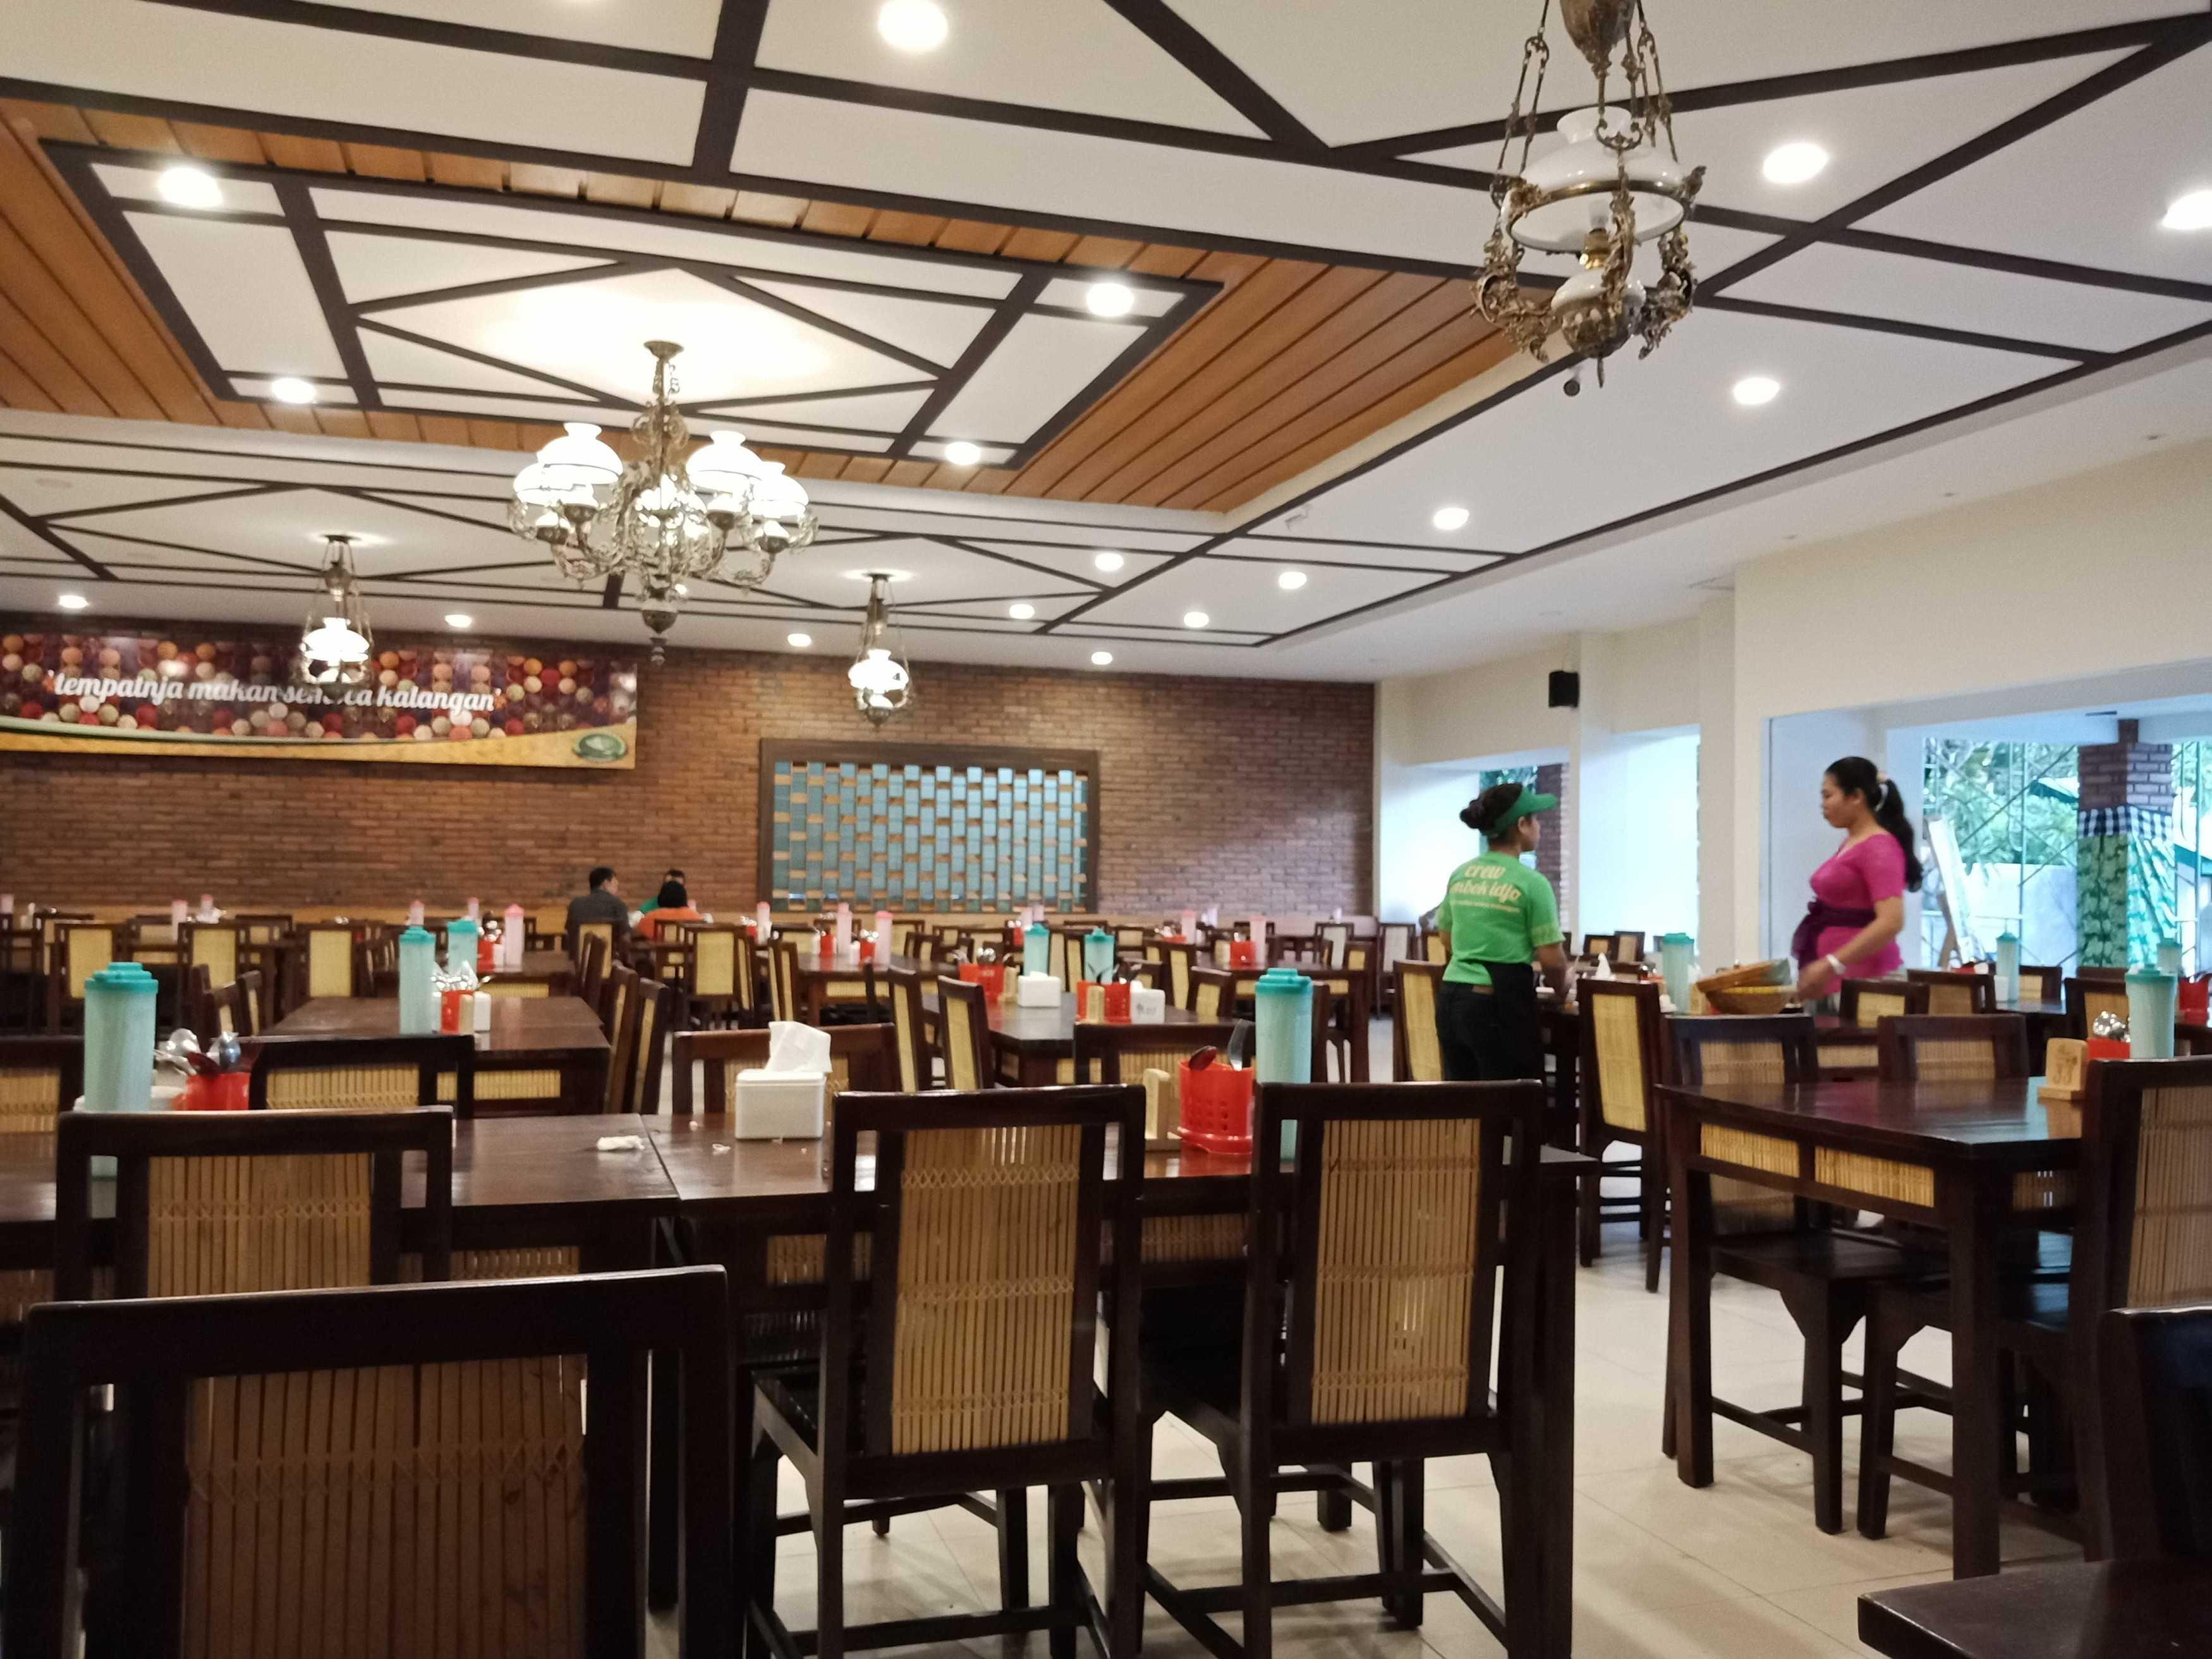 Roku+Architects Restaurant Lombok Idjo Renon Renon, Kec. Denpasar Sel., Kota Denpasar, Bali, Indonesia Renon, Kec. Denpasar Sel., Kota Denpasar, Bali, Indonesia Rokuarchitects-Restaurant-Lombok-Idjo-Renon   115895